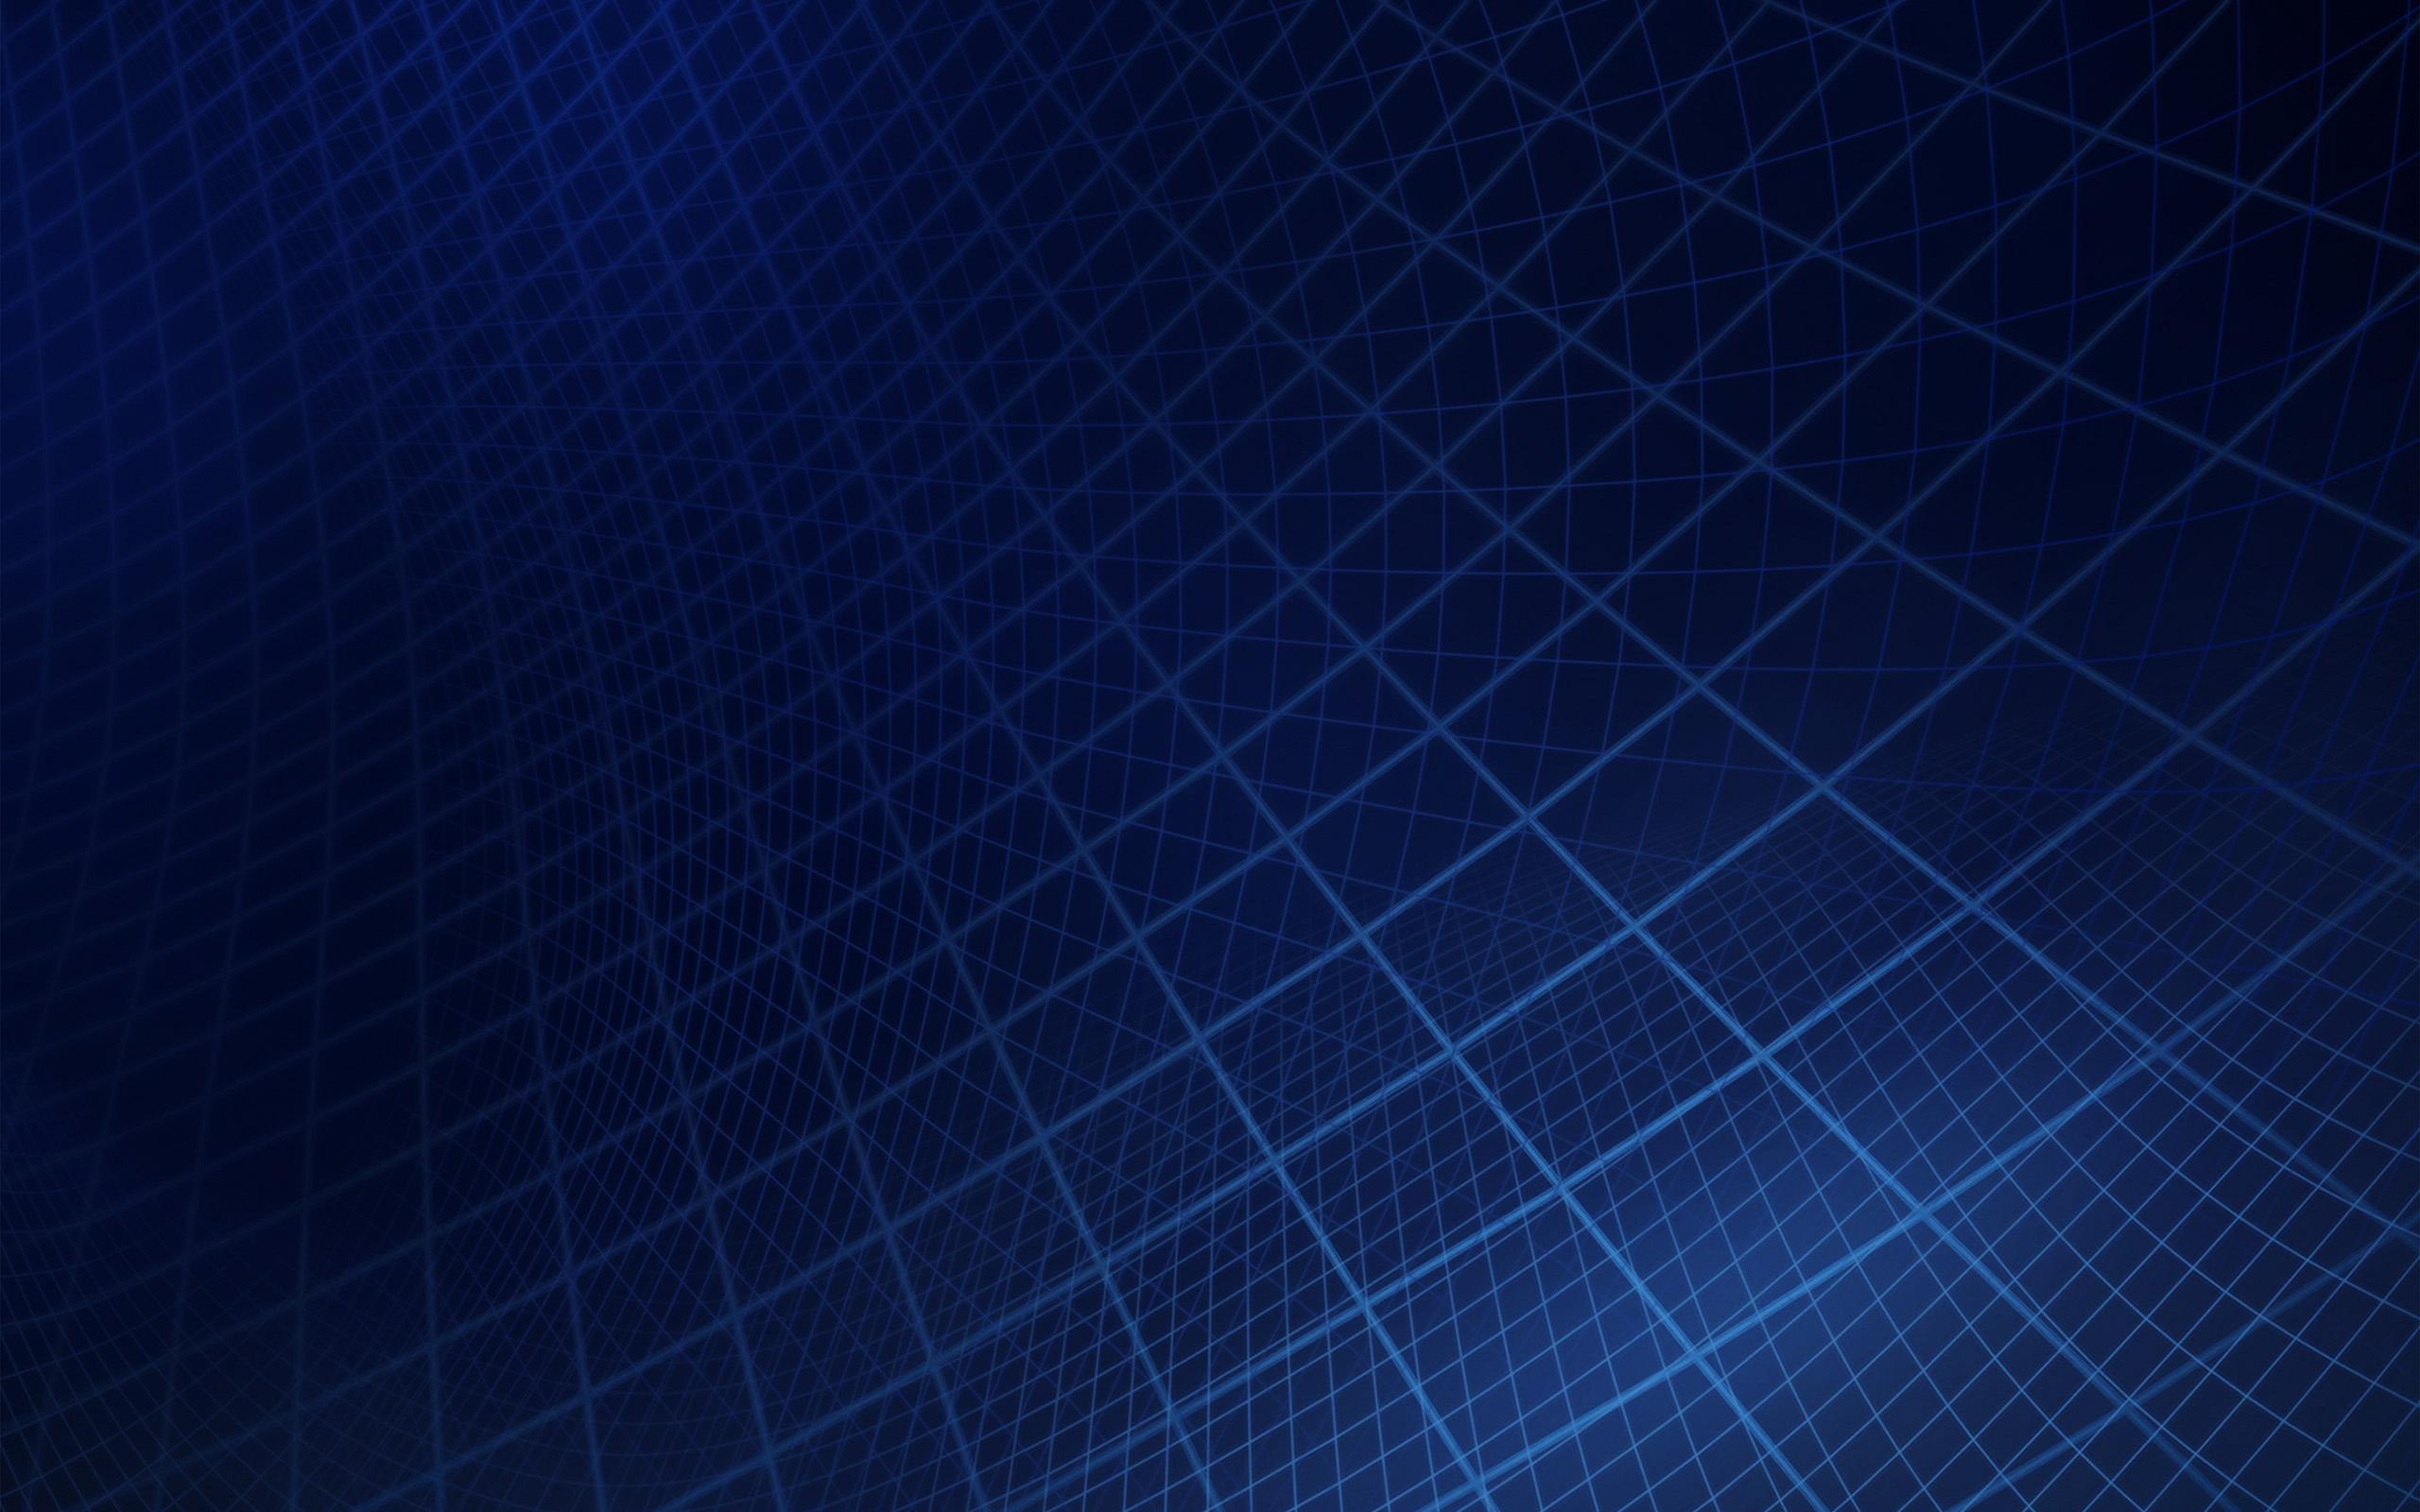 Plain Color Wallpaper For Iphone Vt16 Abstract Line Digital Dark Blue Pattern Wallpaper